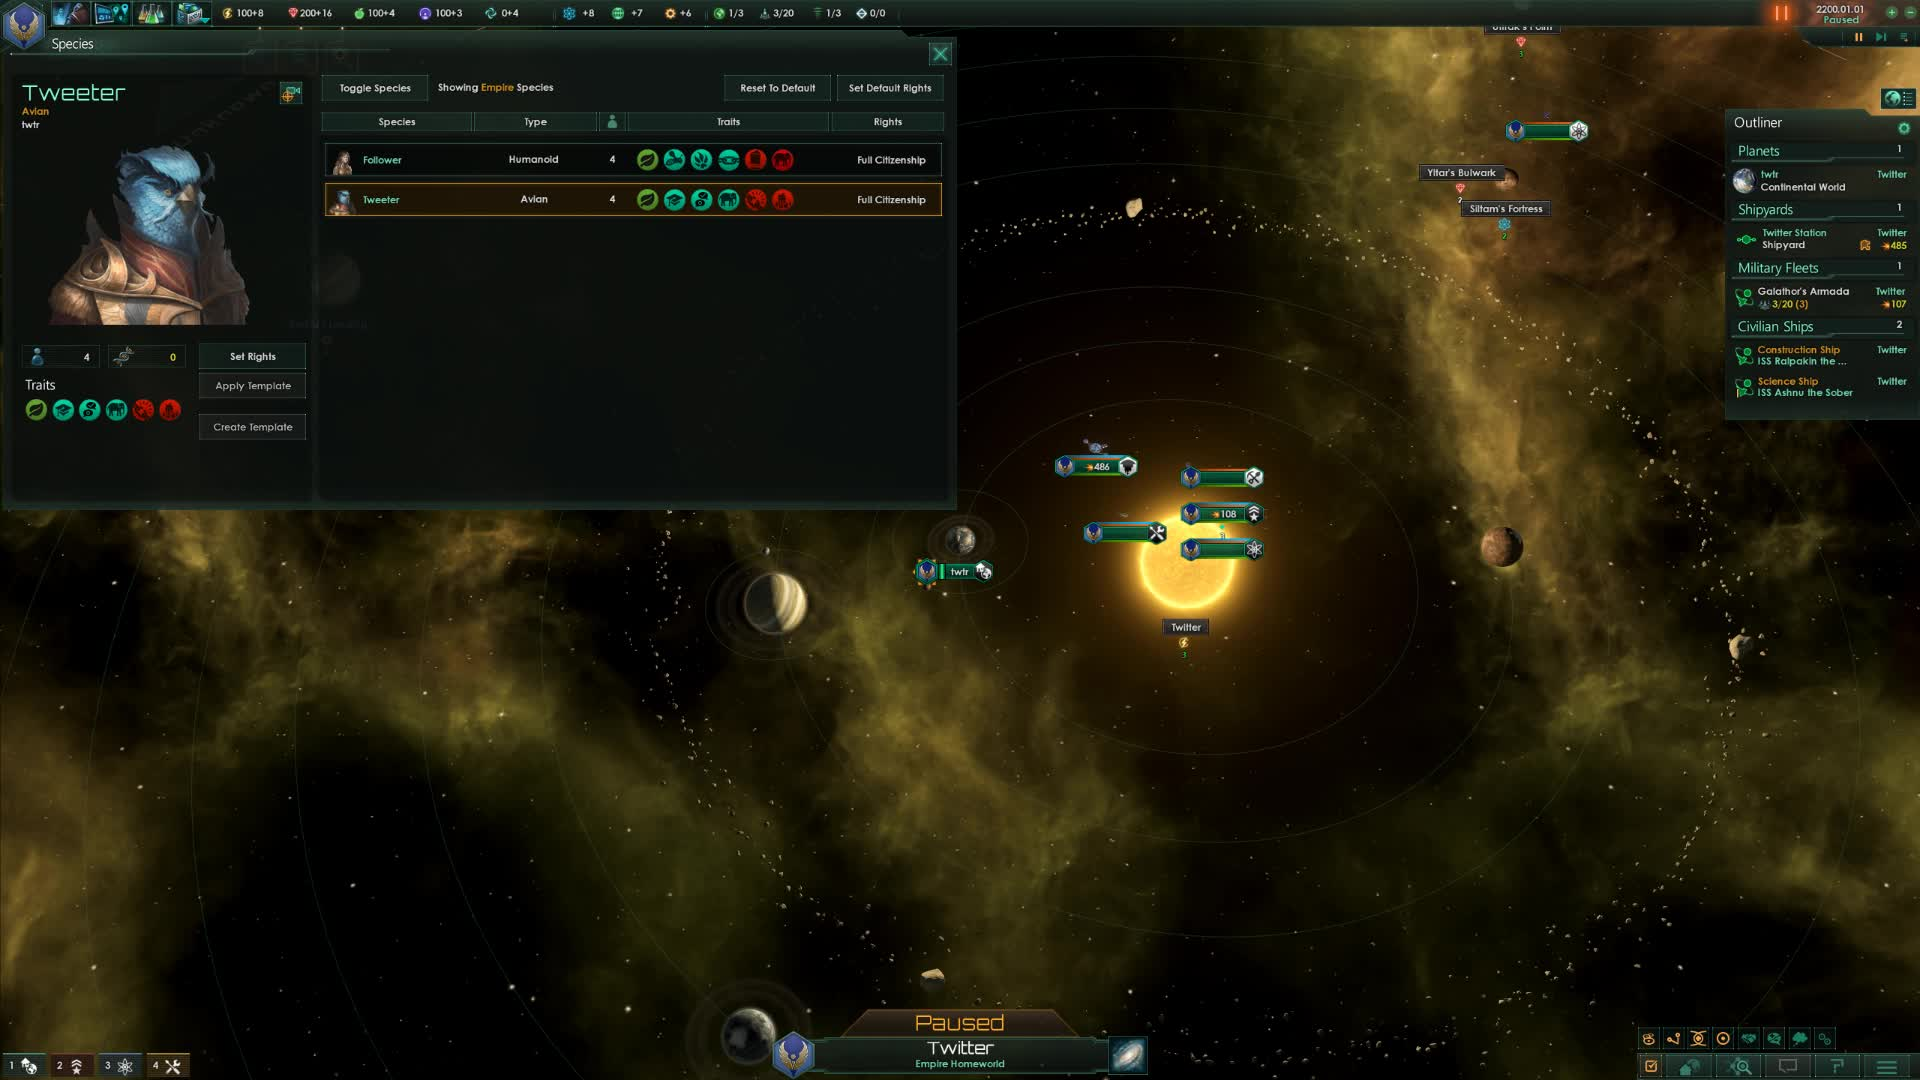 stellaris, Stellaris 2018.07.16 - 16.38.56.01 GIFs